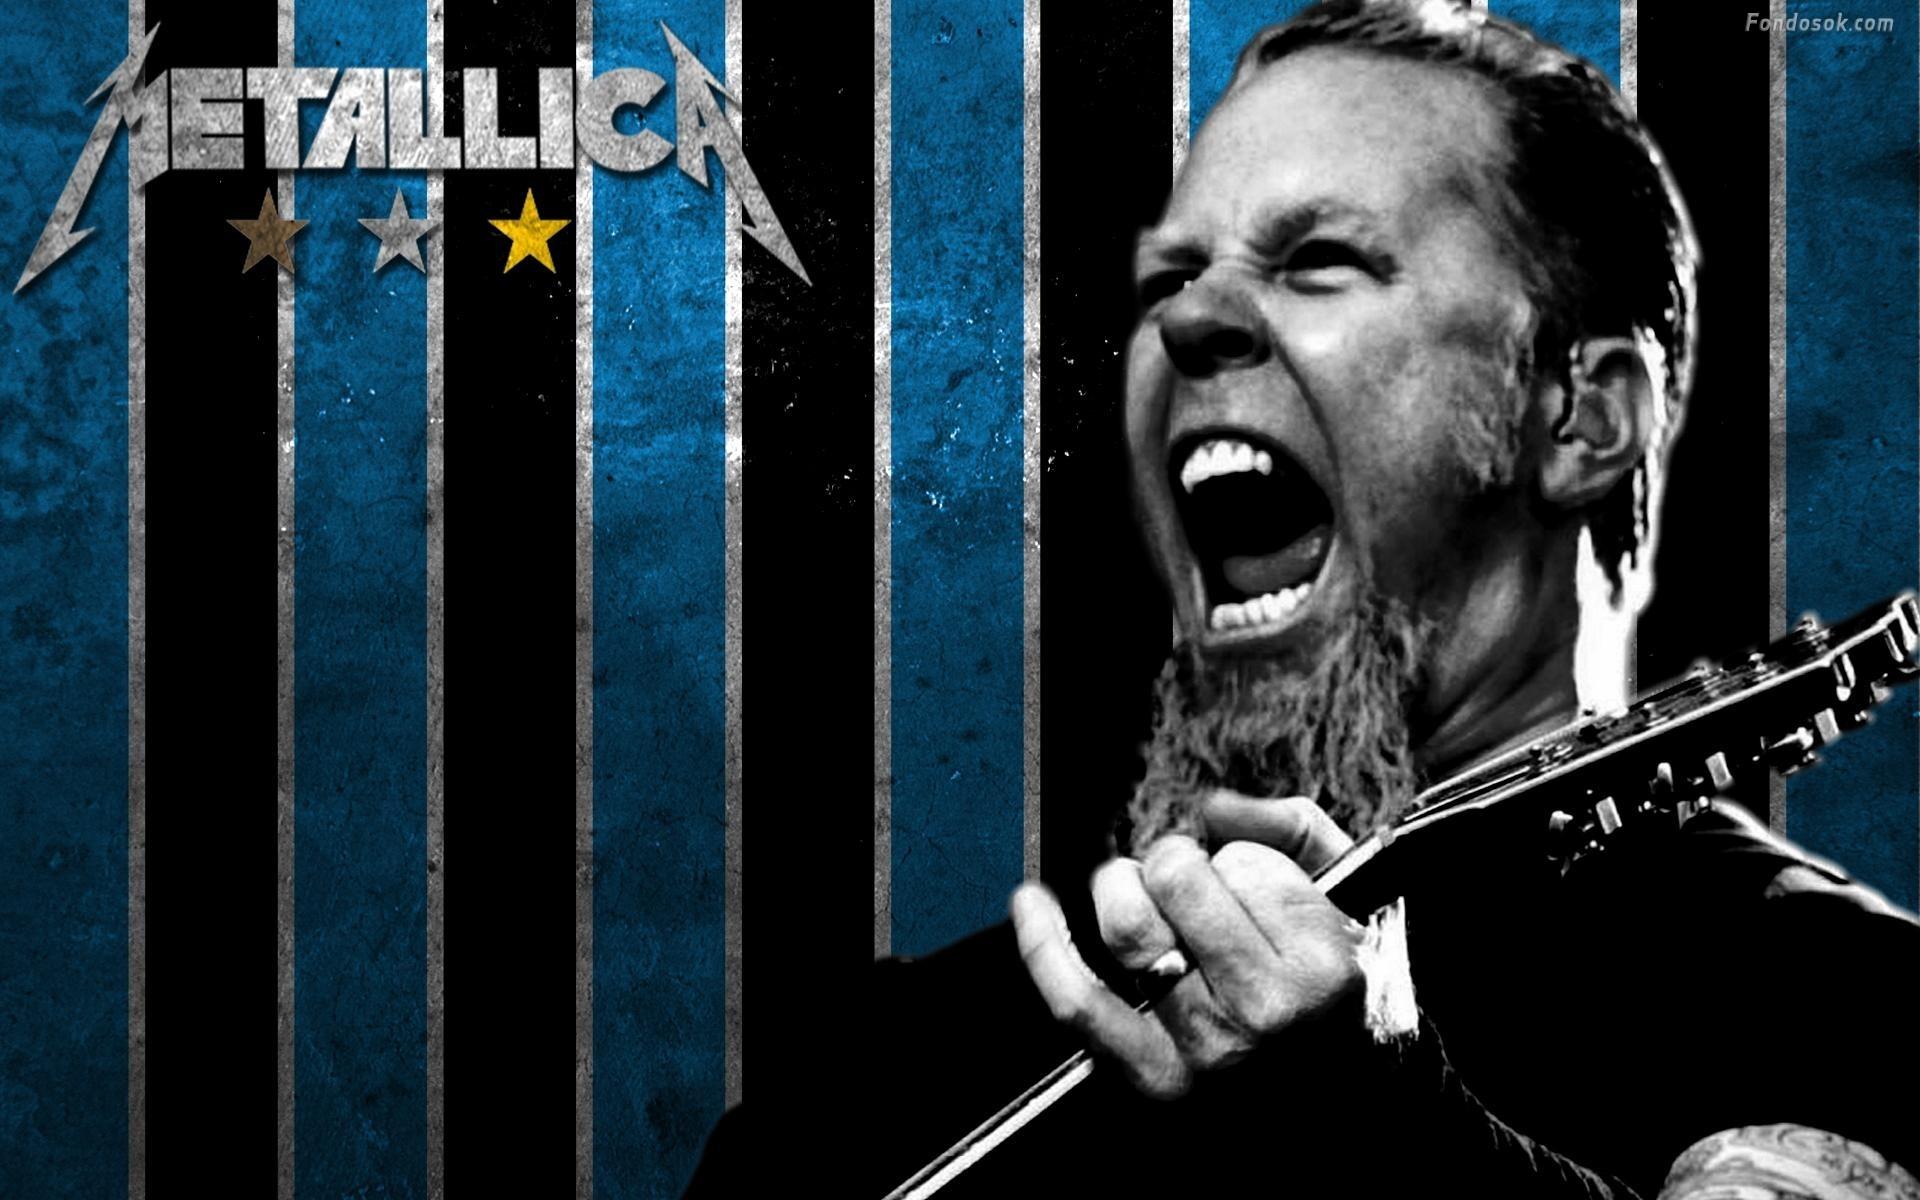 Free Metallica background image | Metallica wallpapers